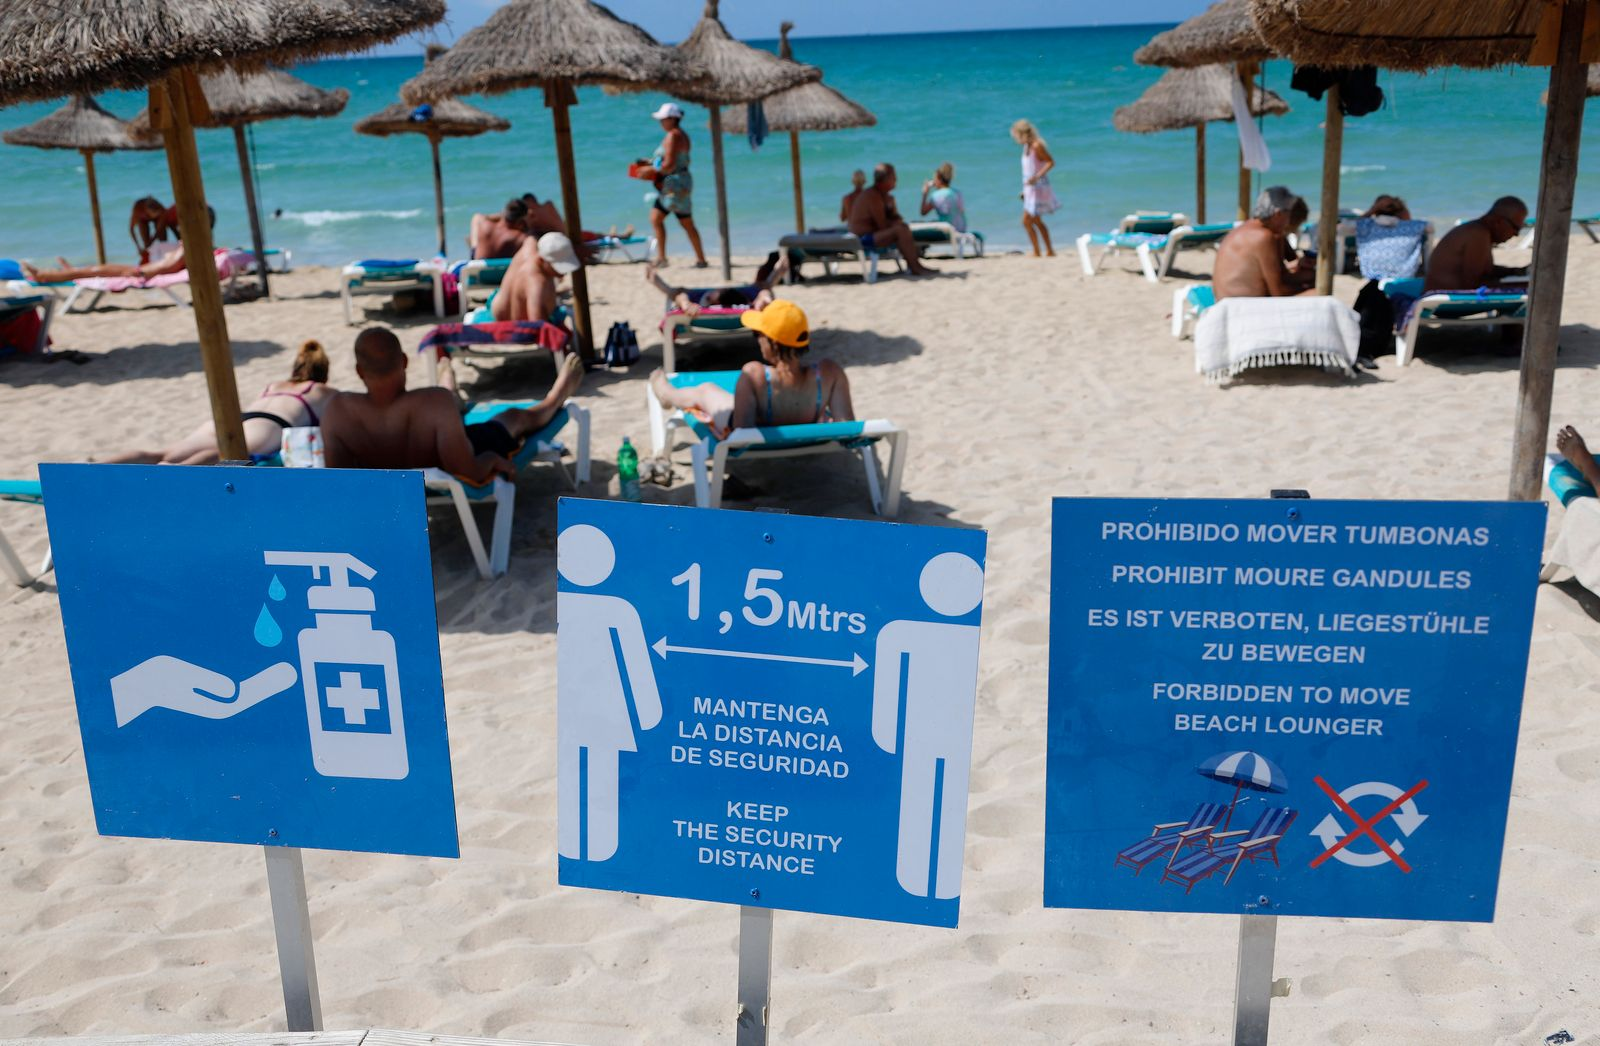 Mallorca als Risikogebiet wegen hoher Corona-Zahlen